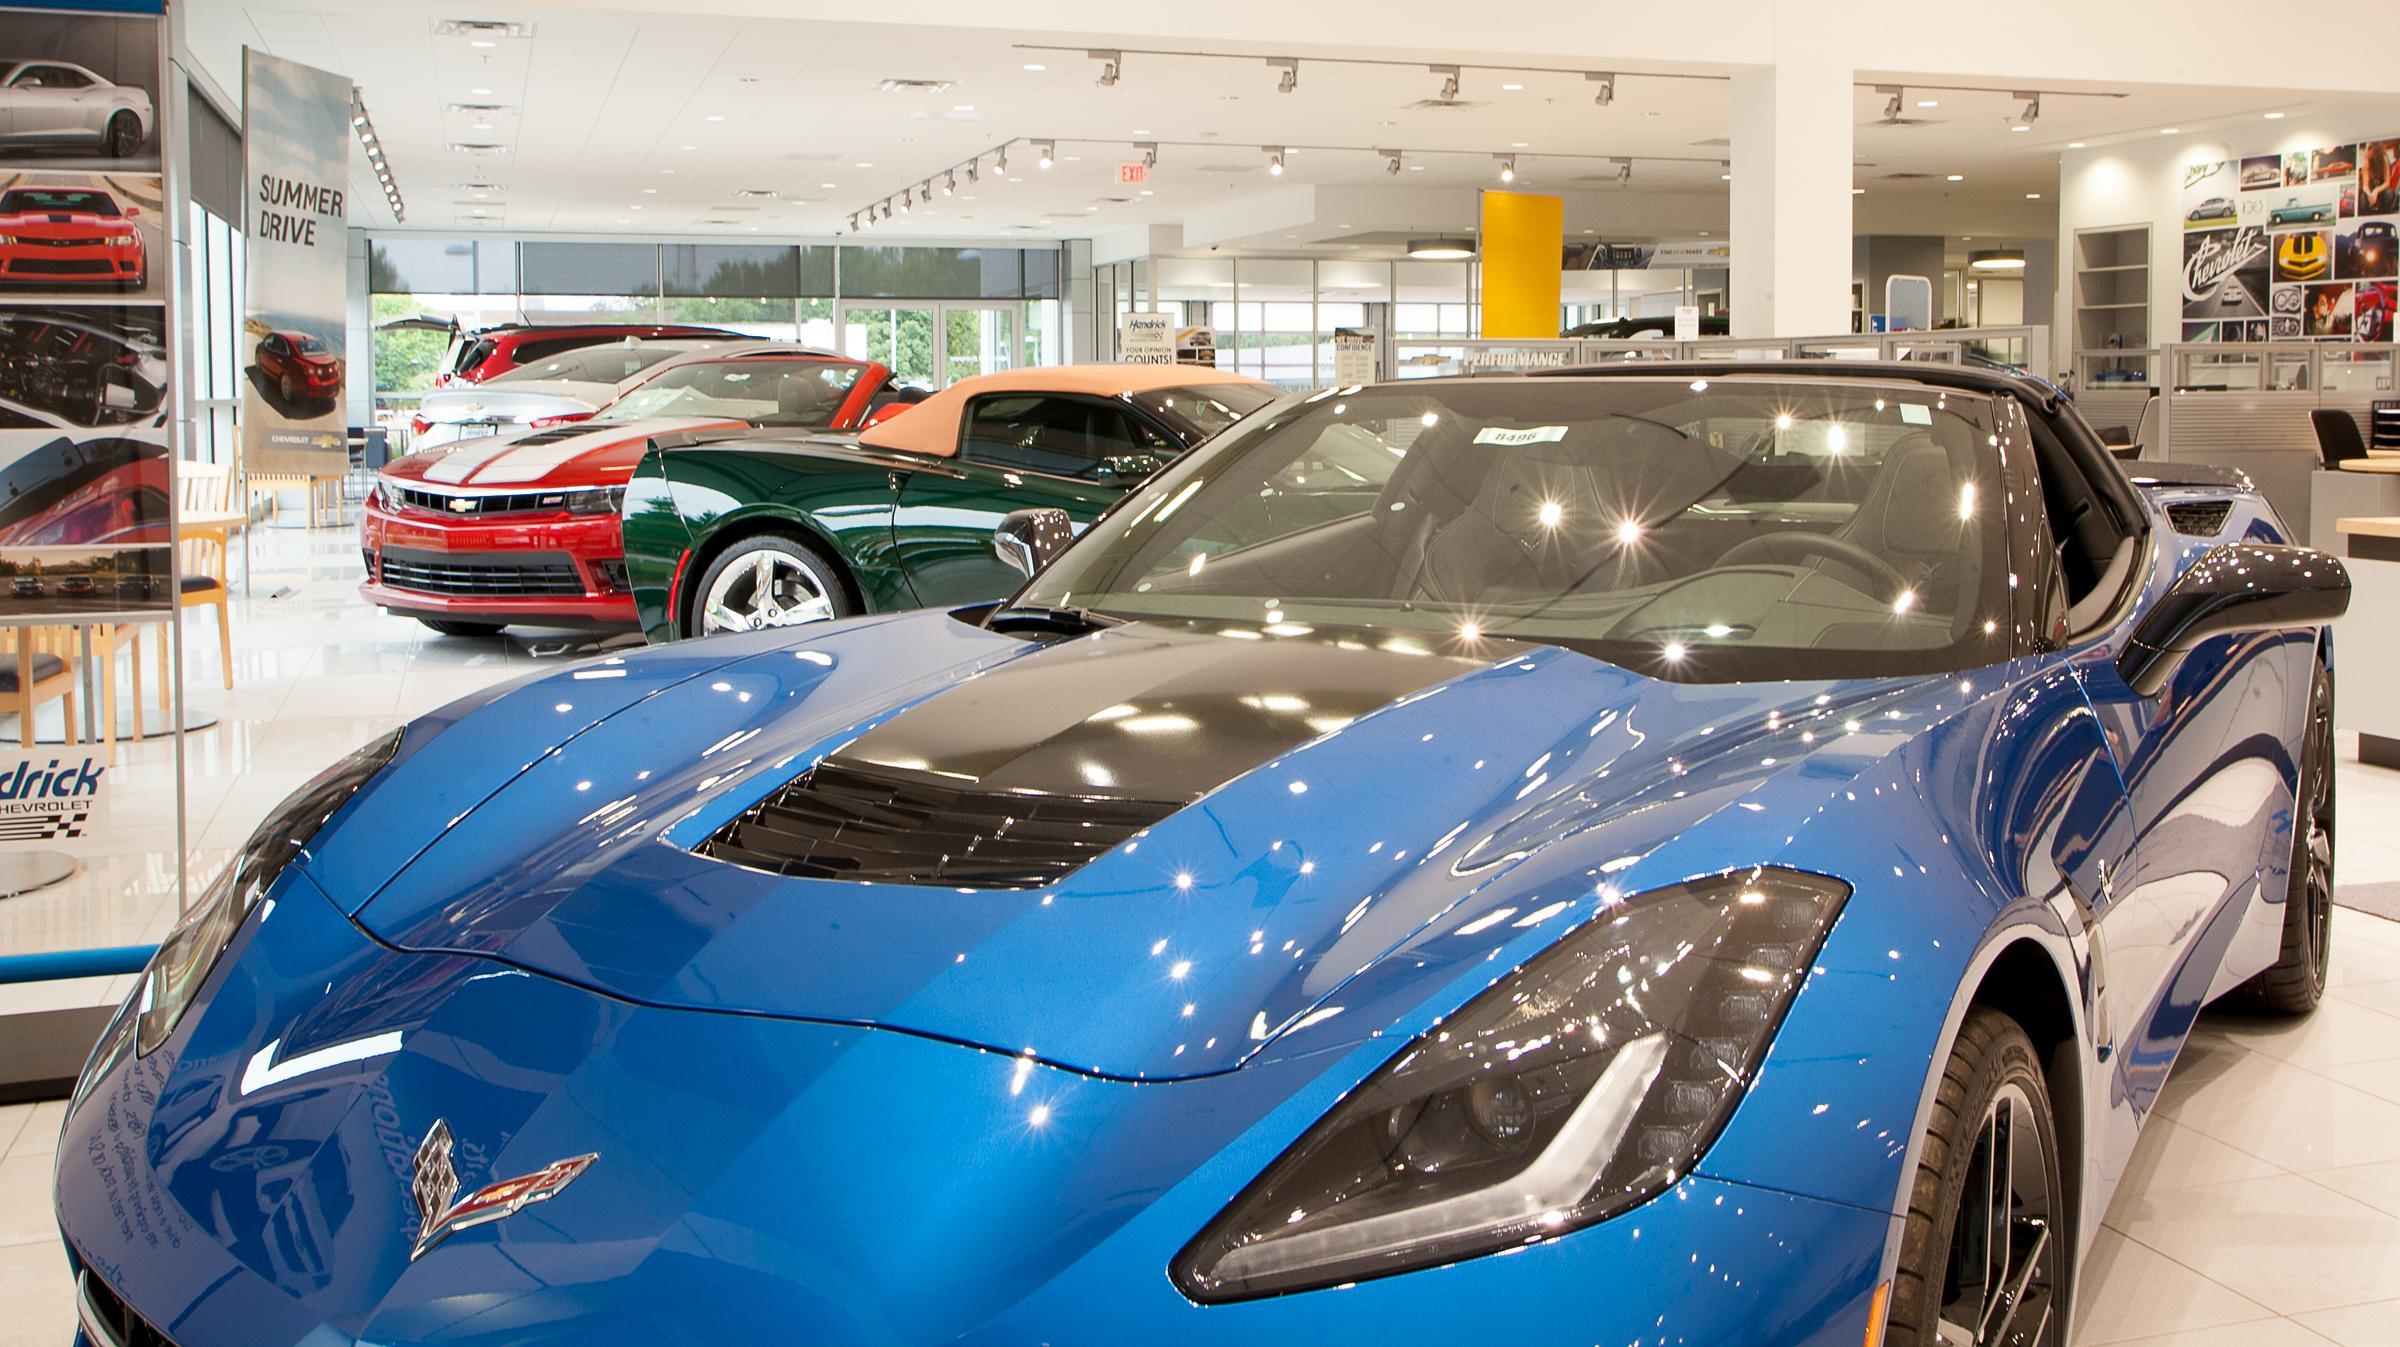 Corvette interior 360 virtual tour showroom auto dealership